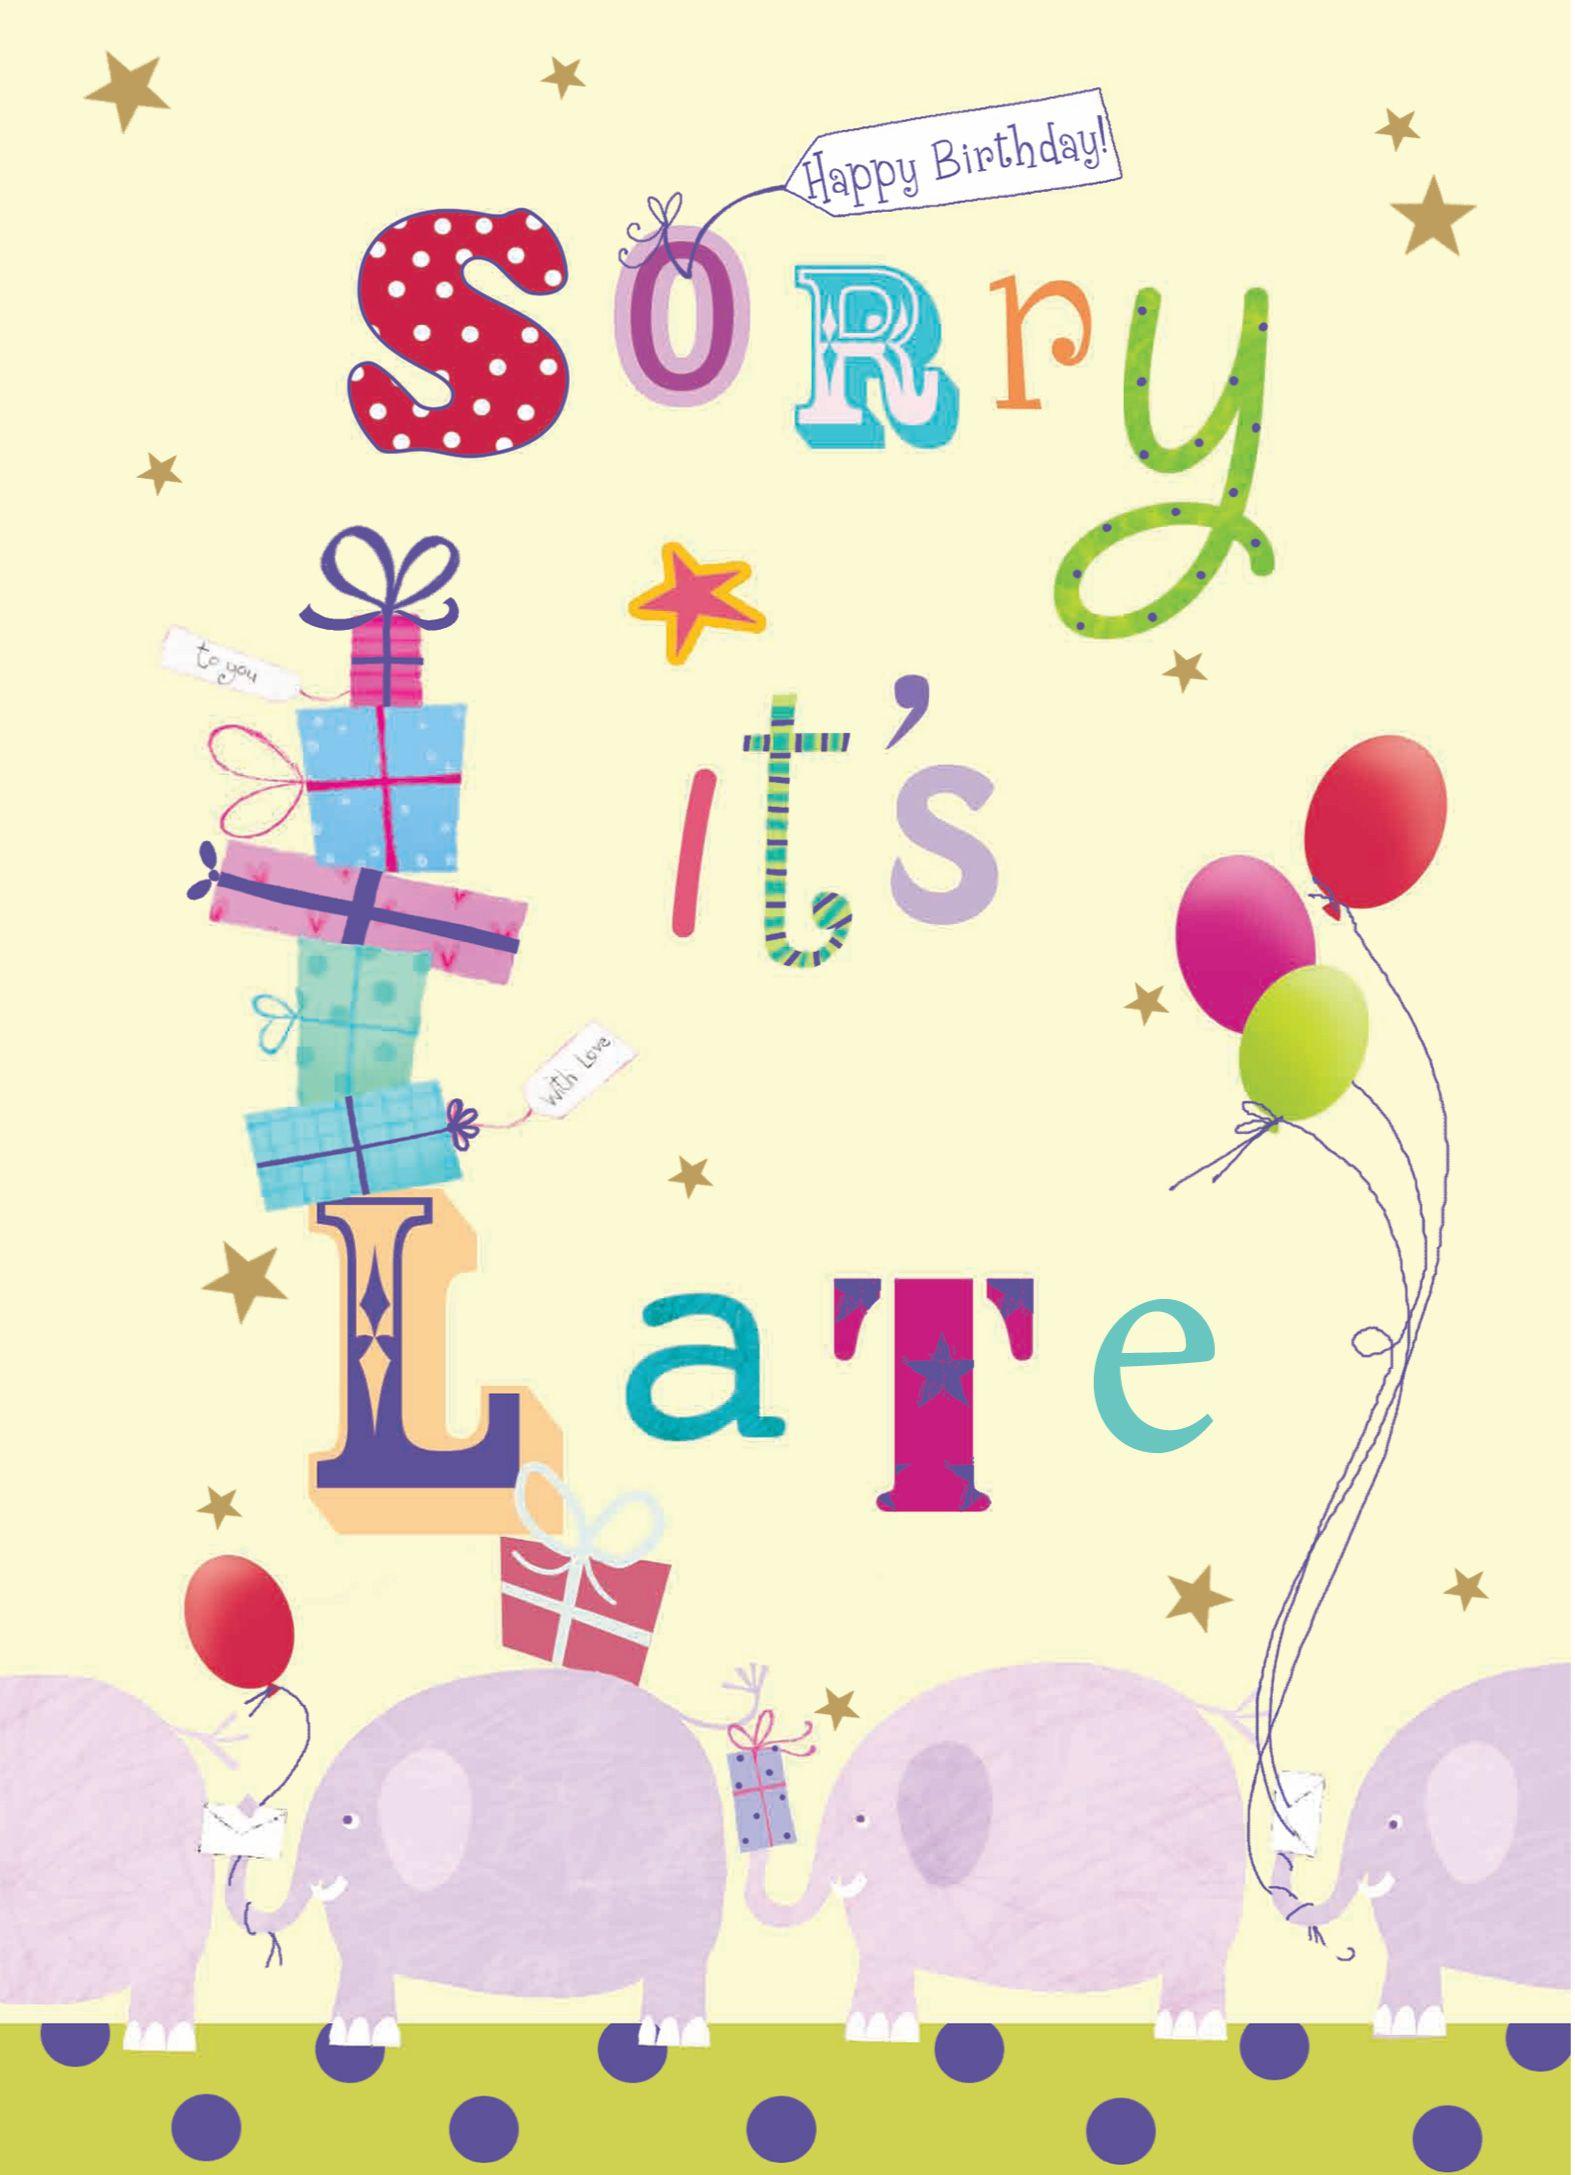 Late birthday wishes. BelatedBirthday BirthdayCards